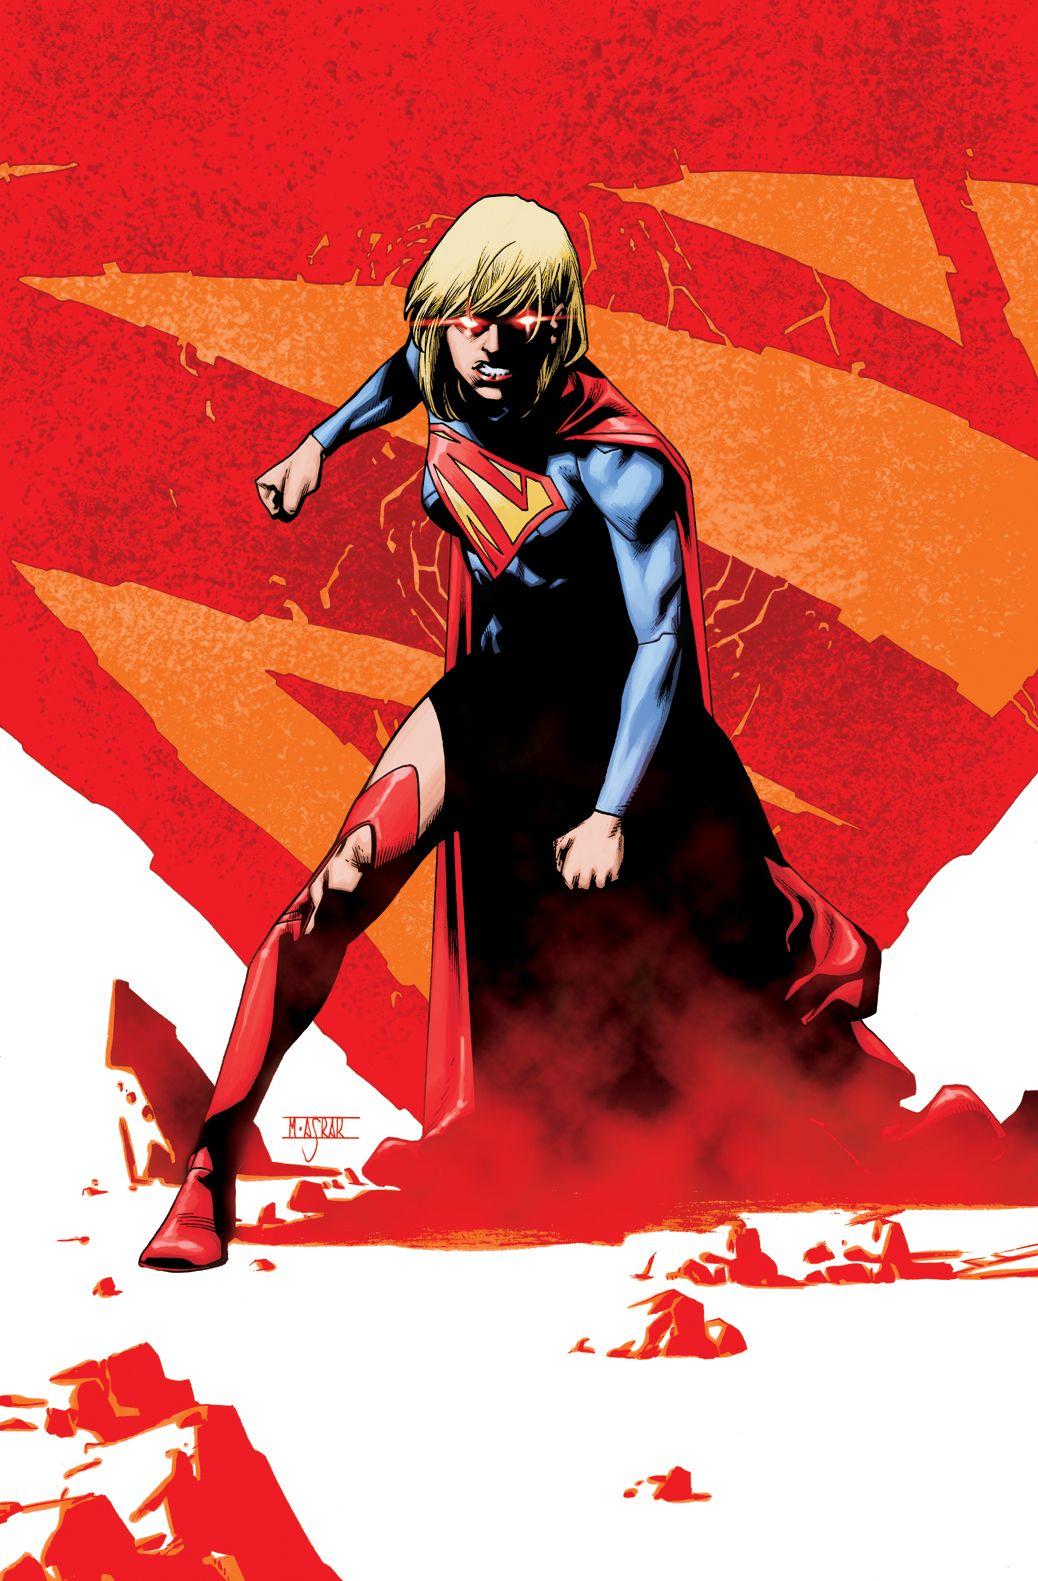 supergirl drawings comic - photo #16